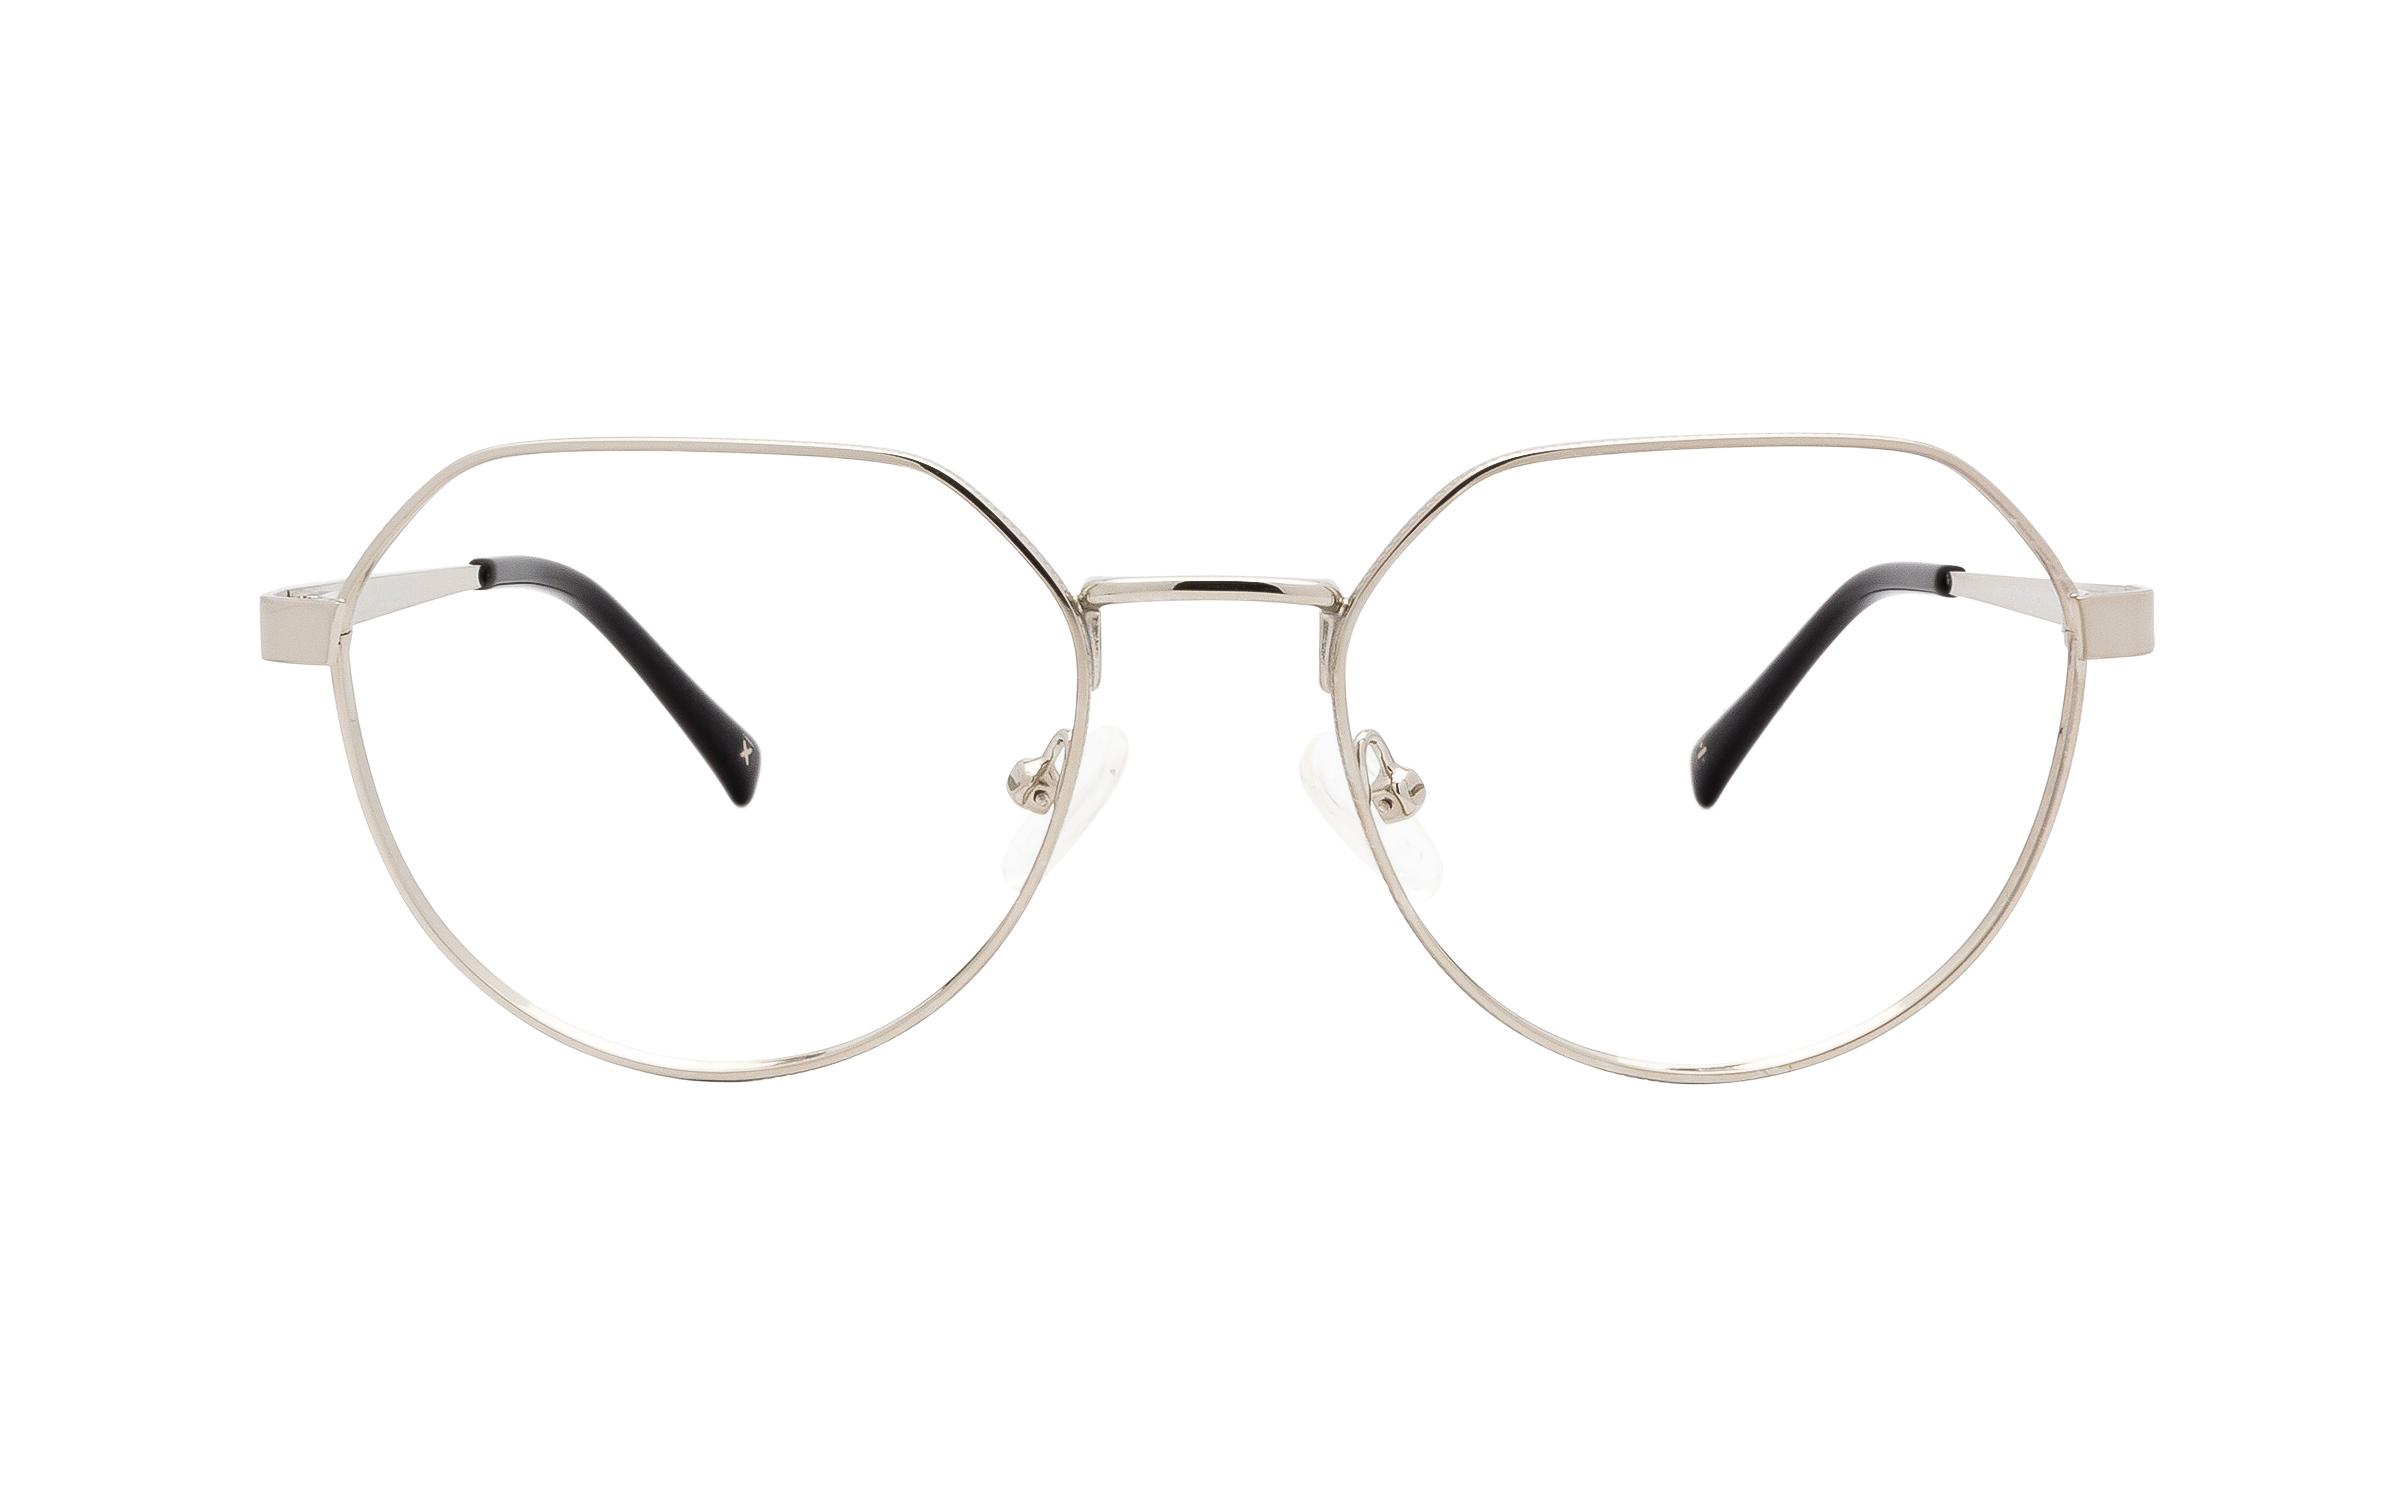 http://www.coastal.com/ - Derek Cardigan Volans DC229 C01 (51) Eyeglasses and Frame in Shiny Silver | Metal – Online Coastal